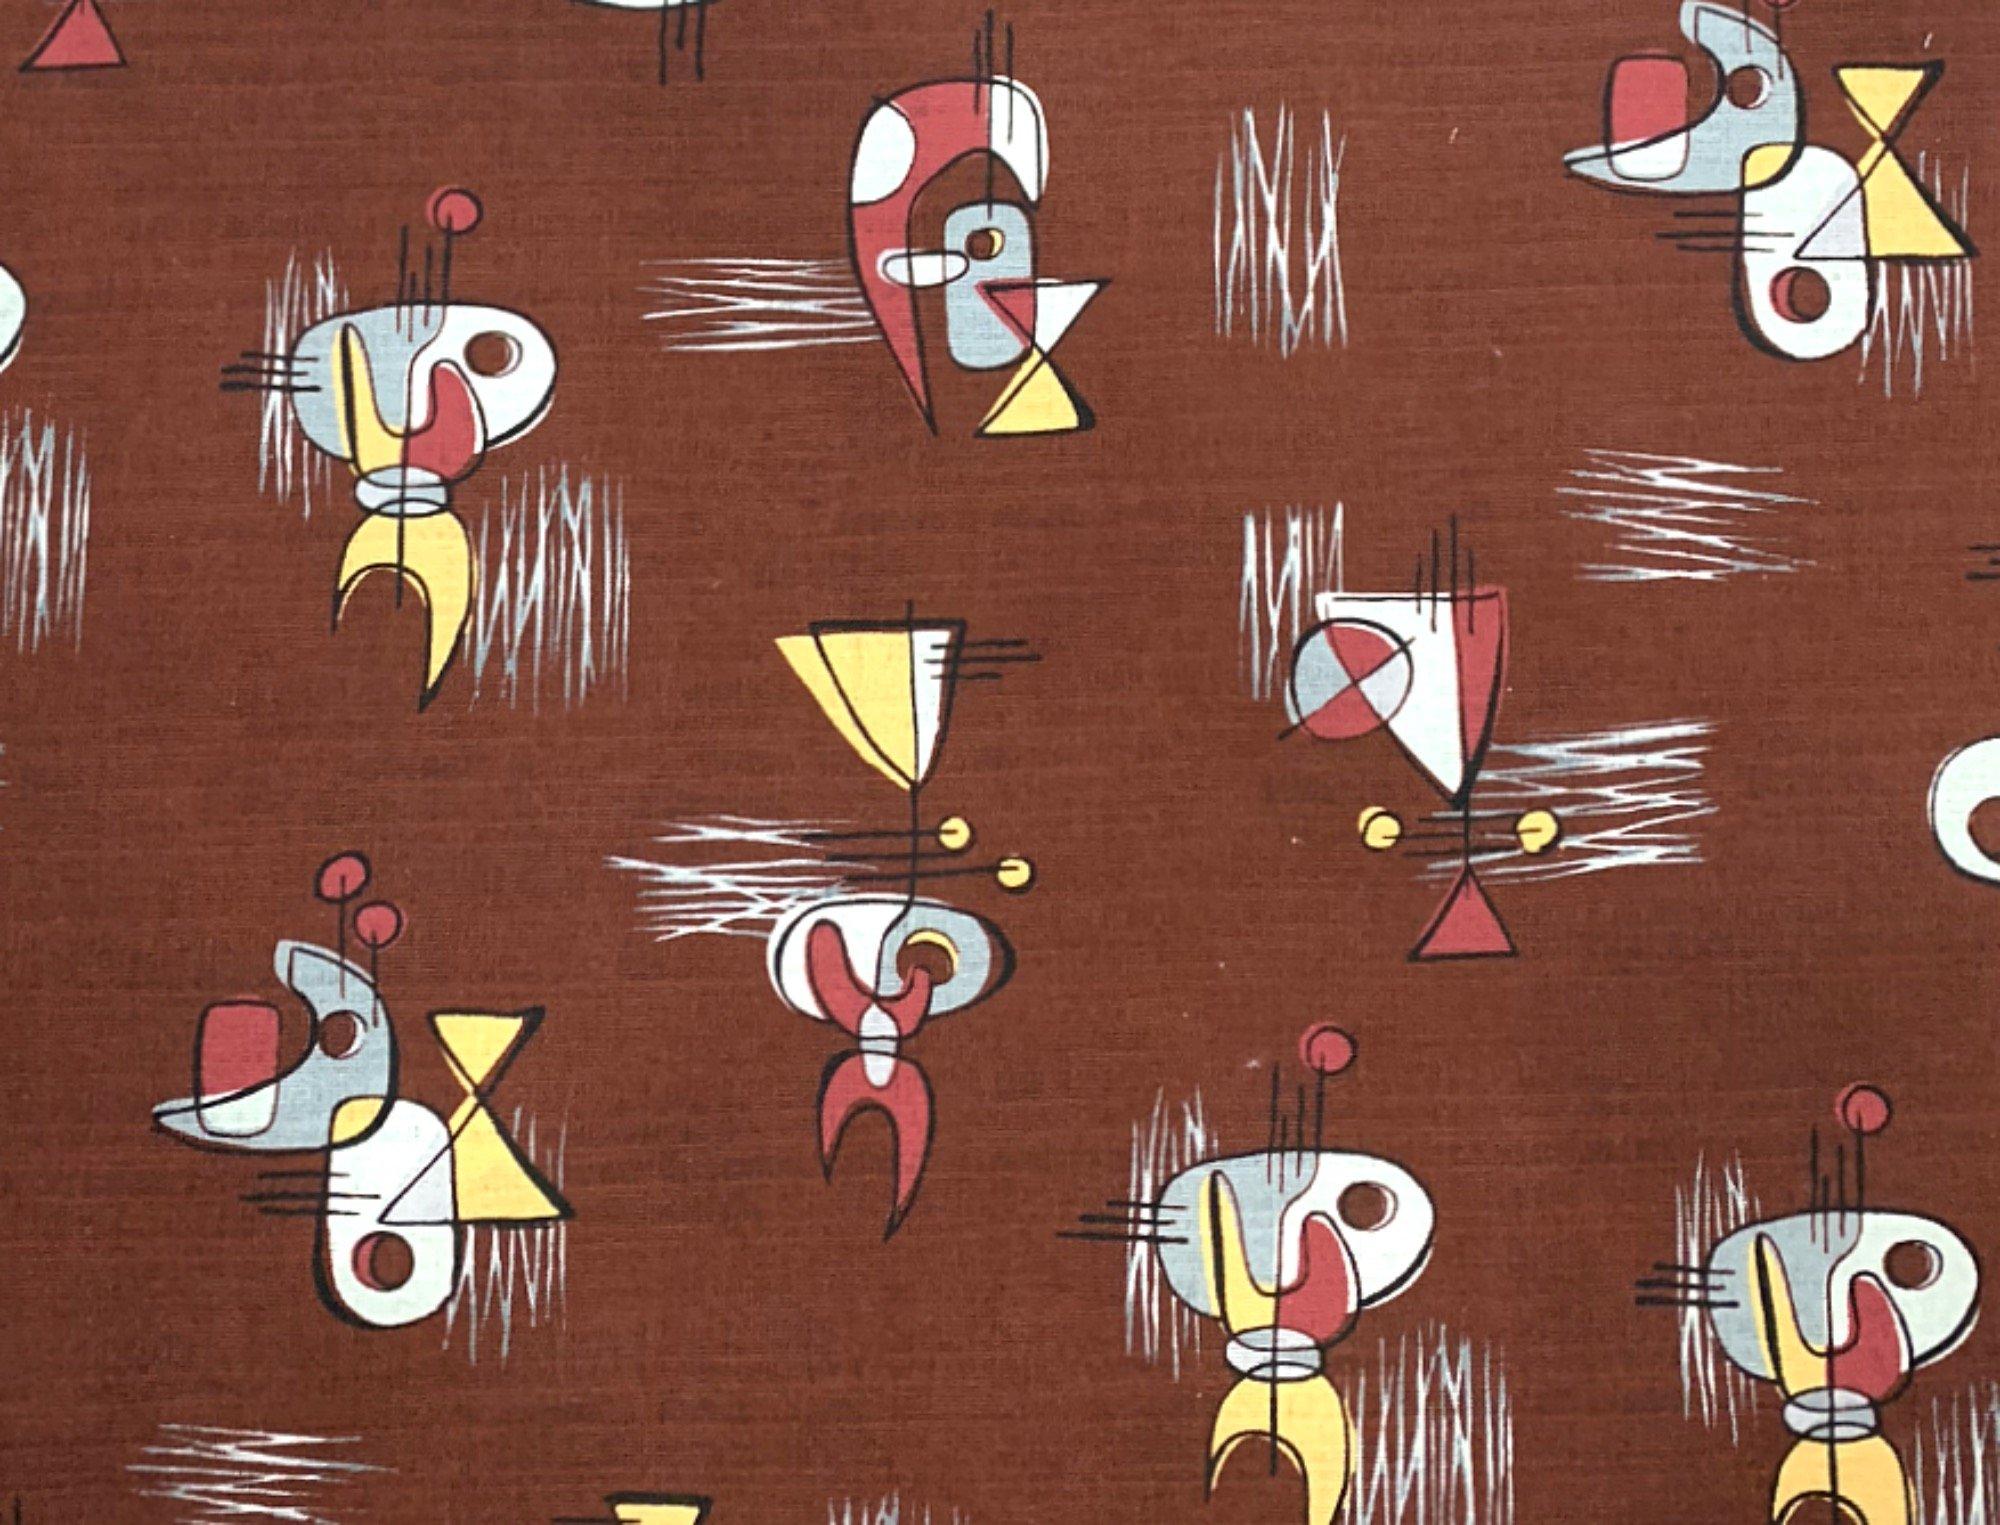 Coming Soon! Atomic Retro Mid Century Modern Boomerang Sputnik Space Age MCM Cotton Fabric Light Weight Canvas